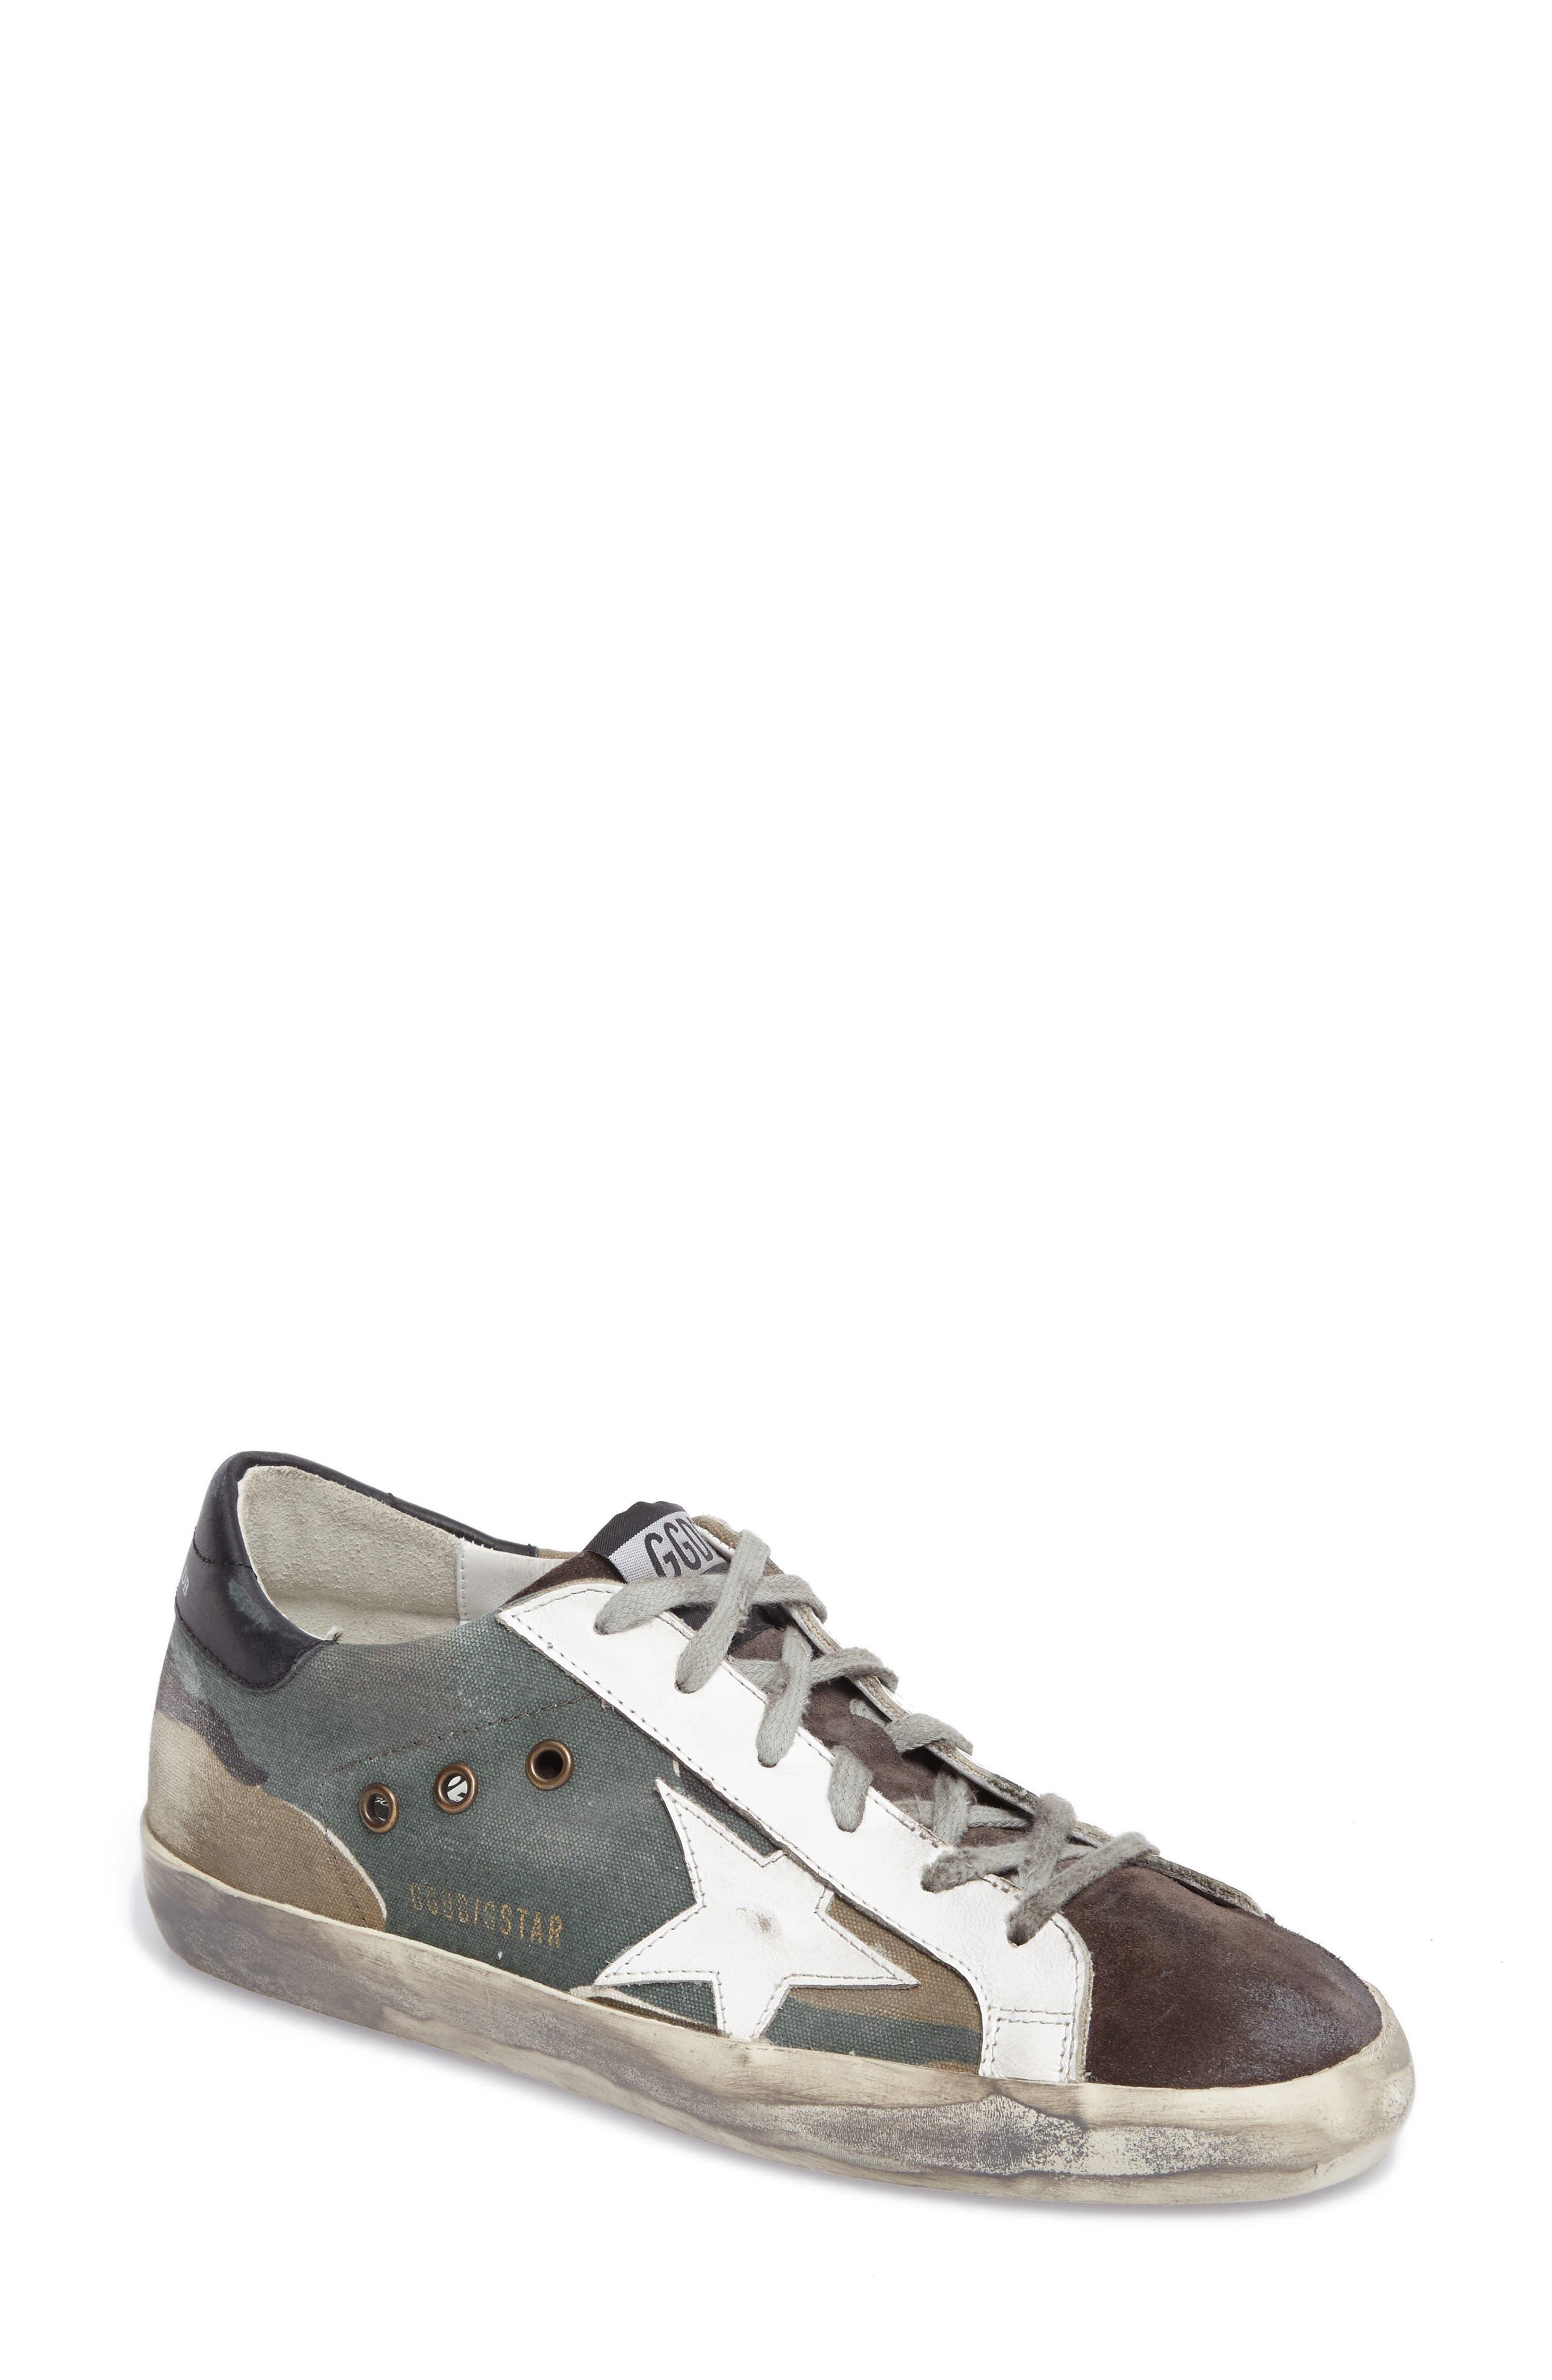 Superstar Low Top Sneaker,                         Main,                         color, Camou Grey